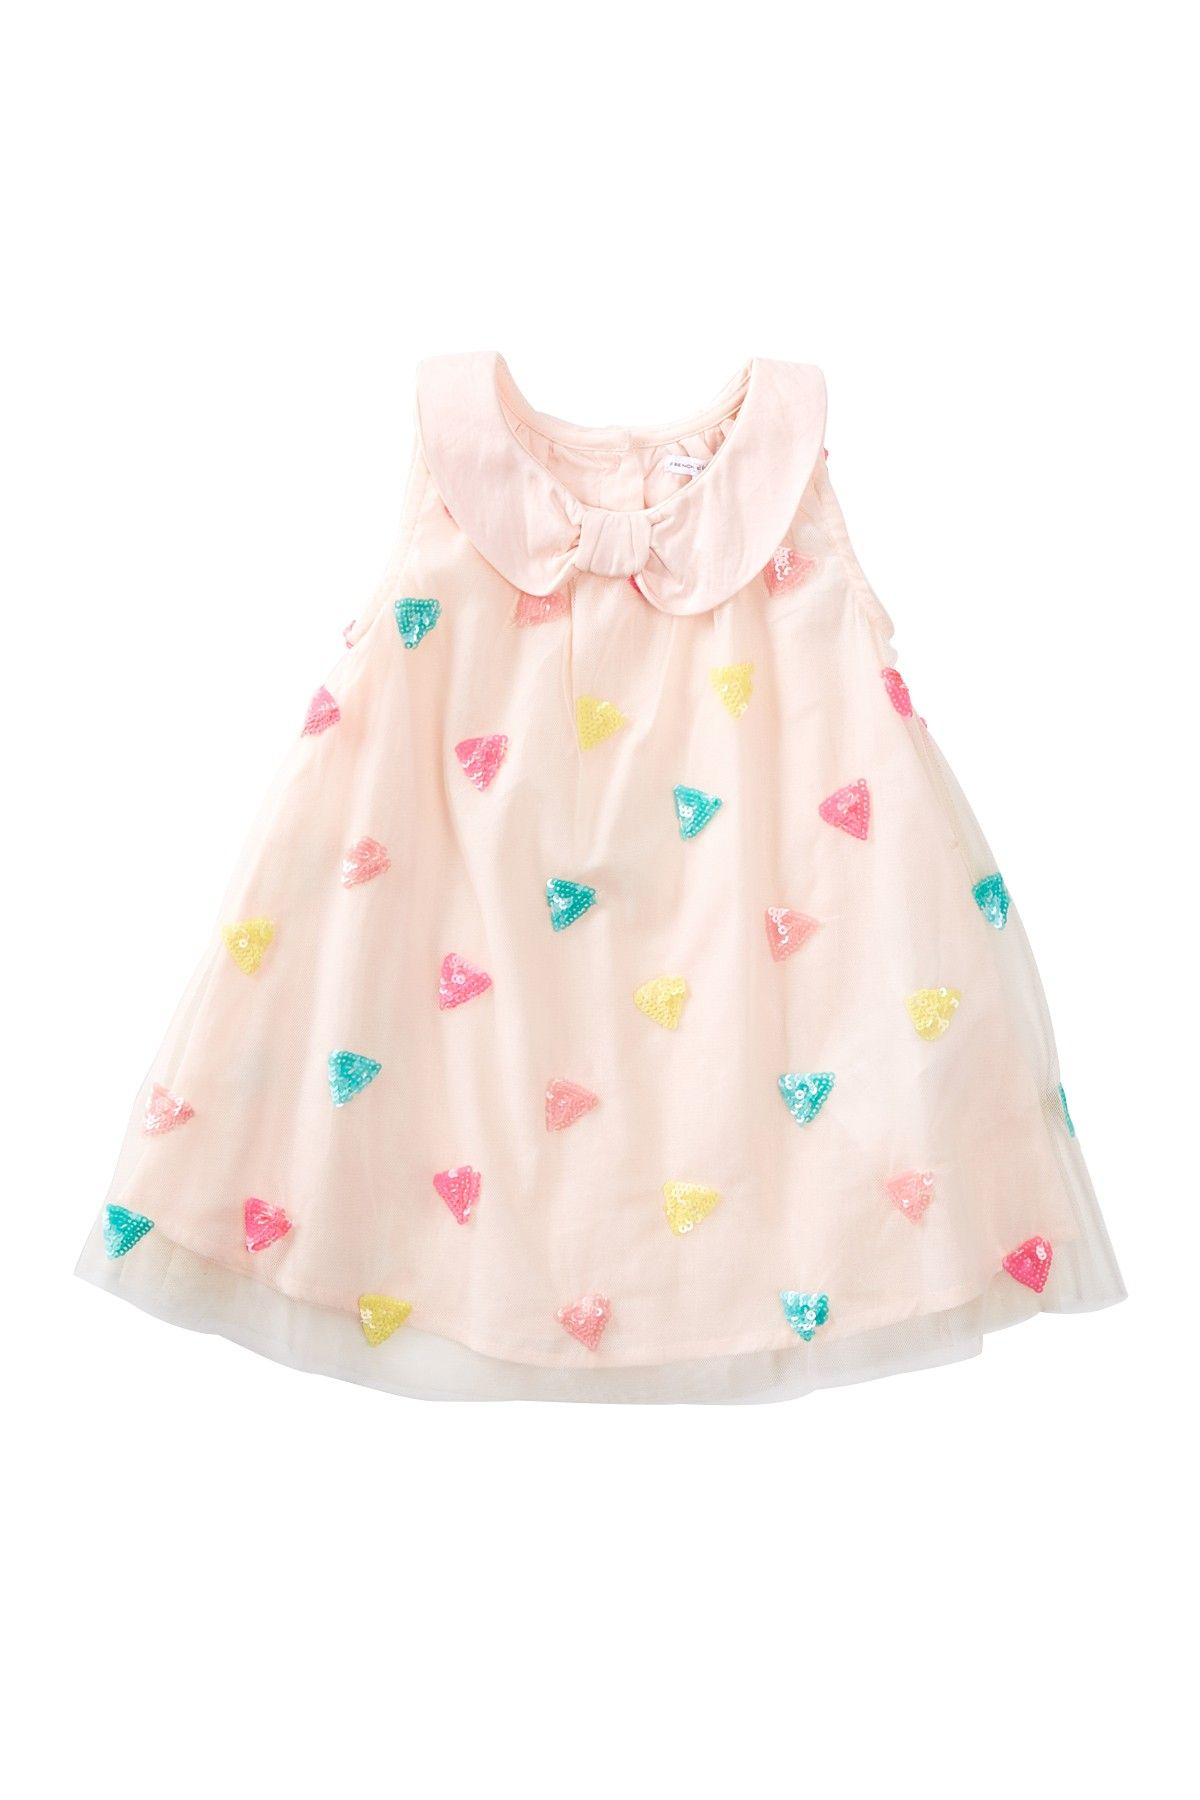 Sequin Triangle Dress Baby Girls